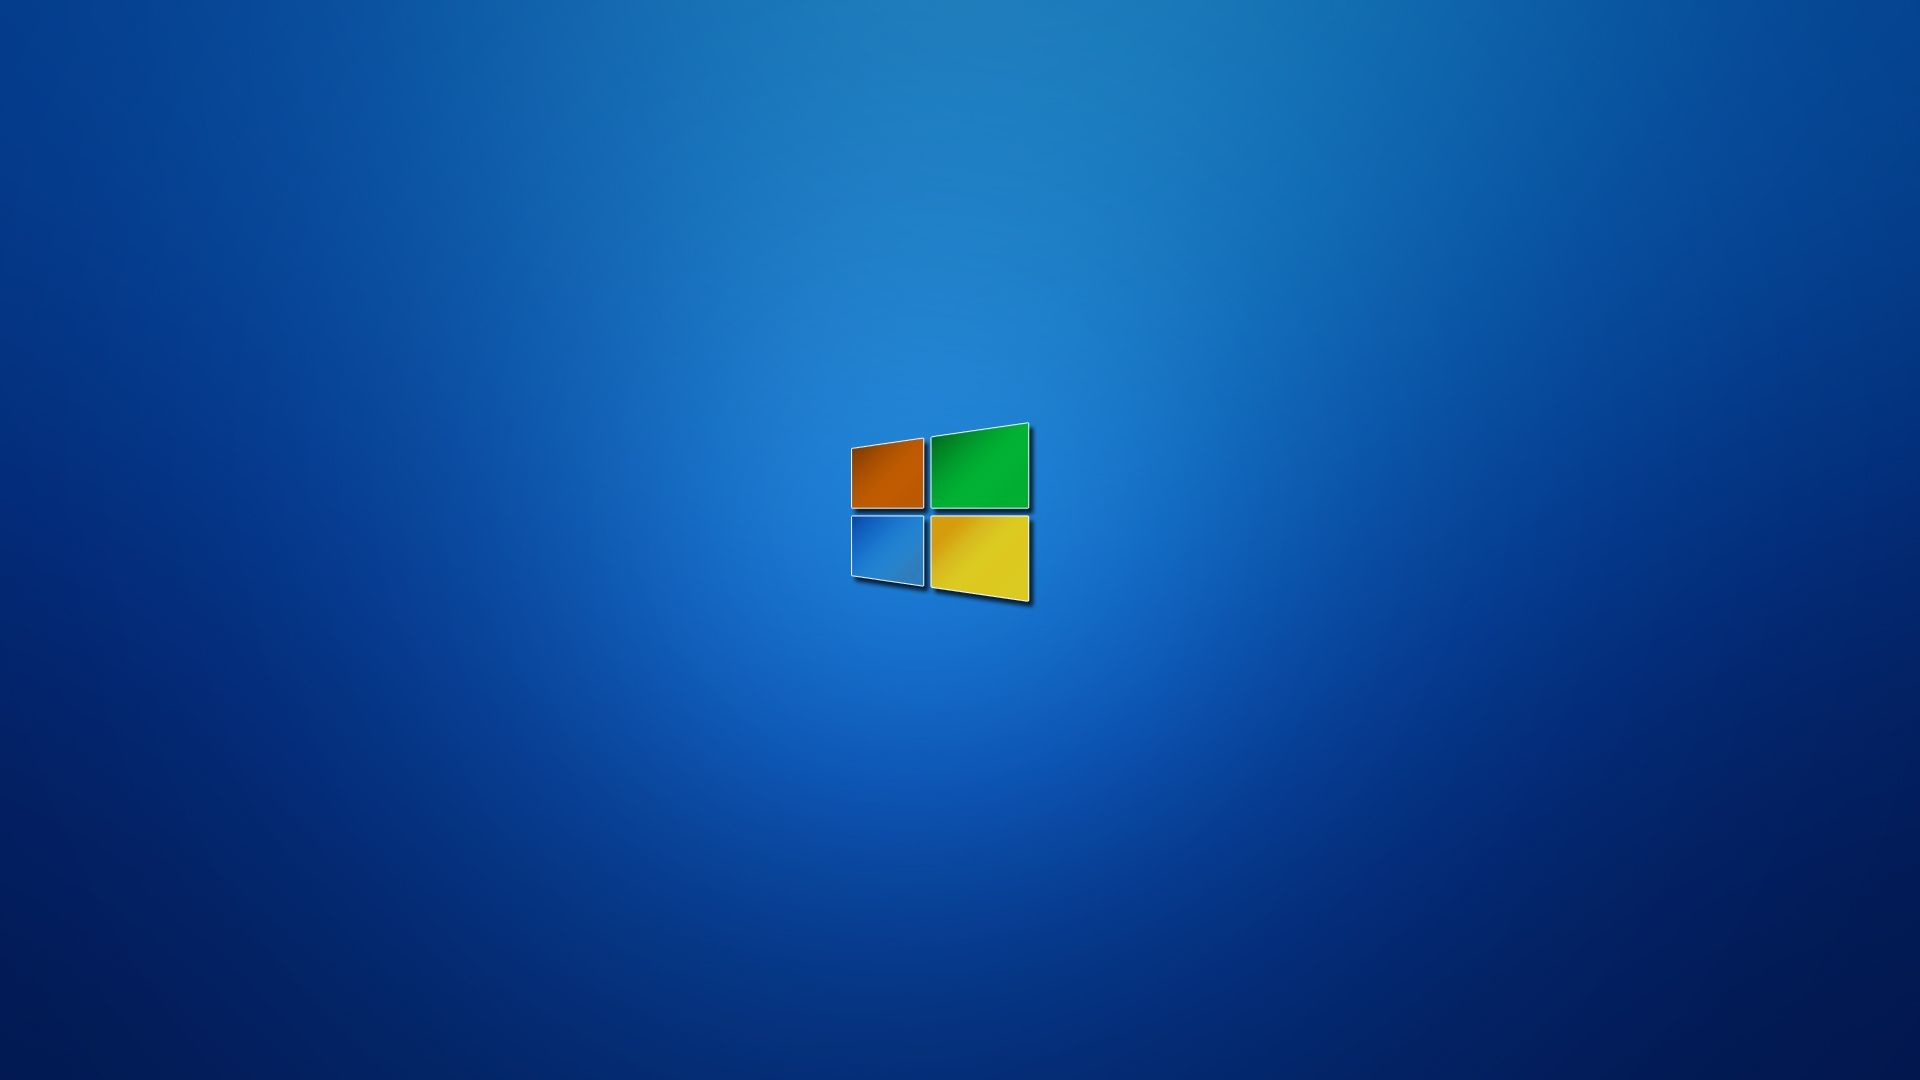 Windows Nt Wallpaper (83+ images)